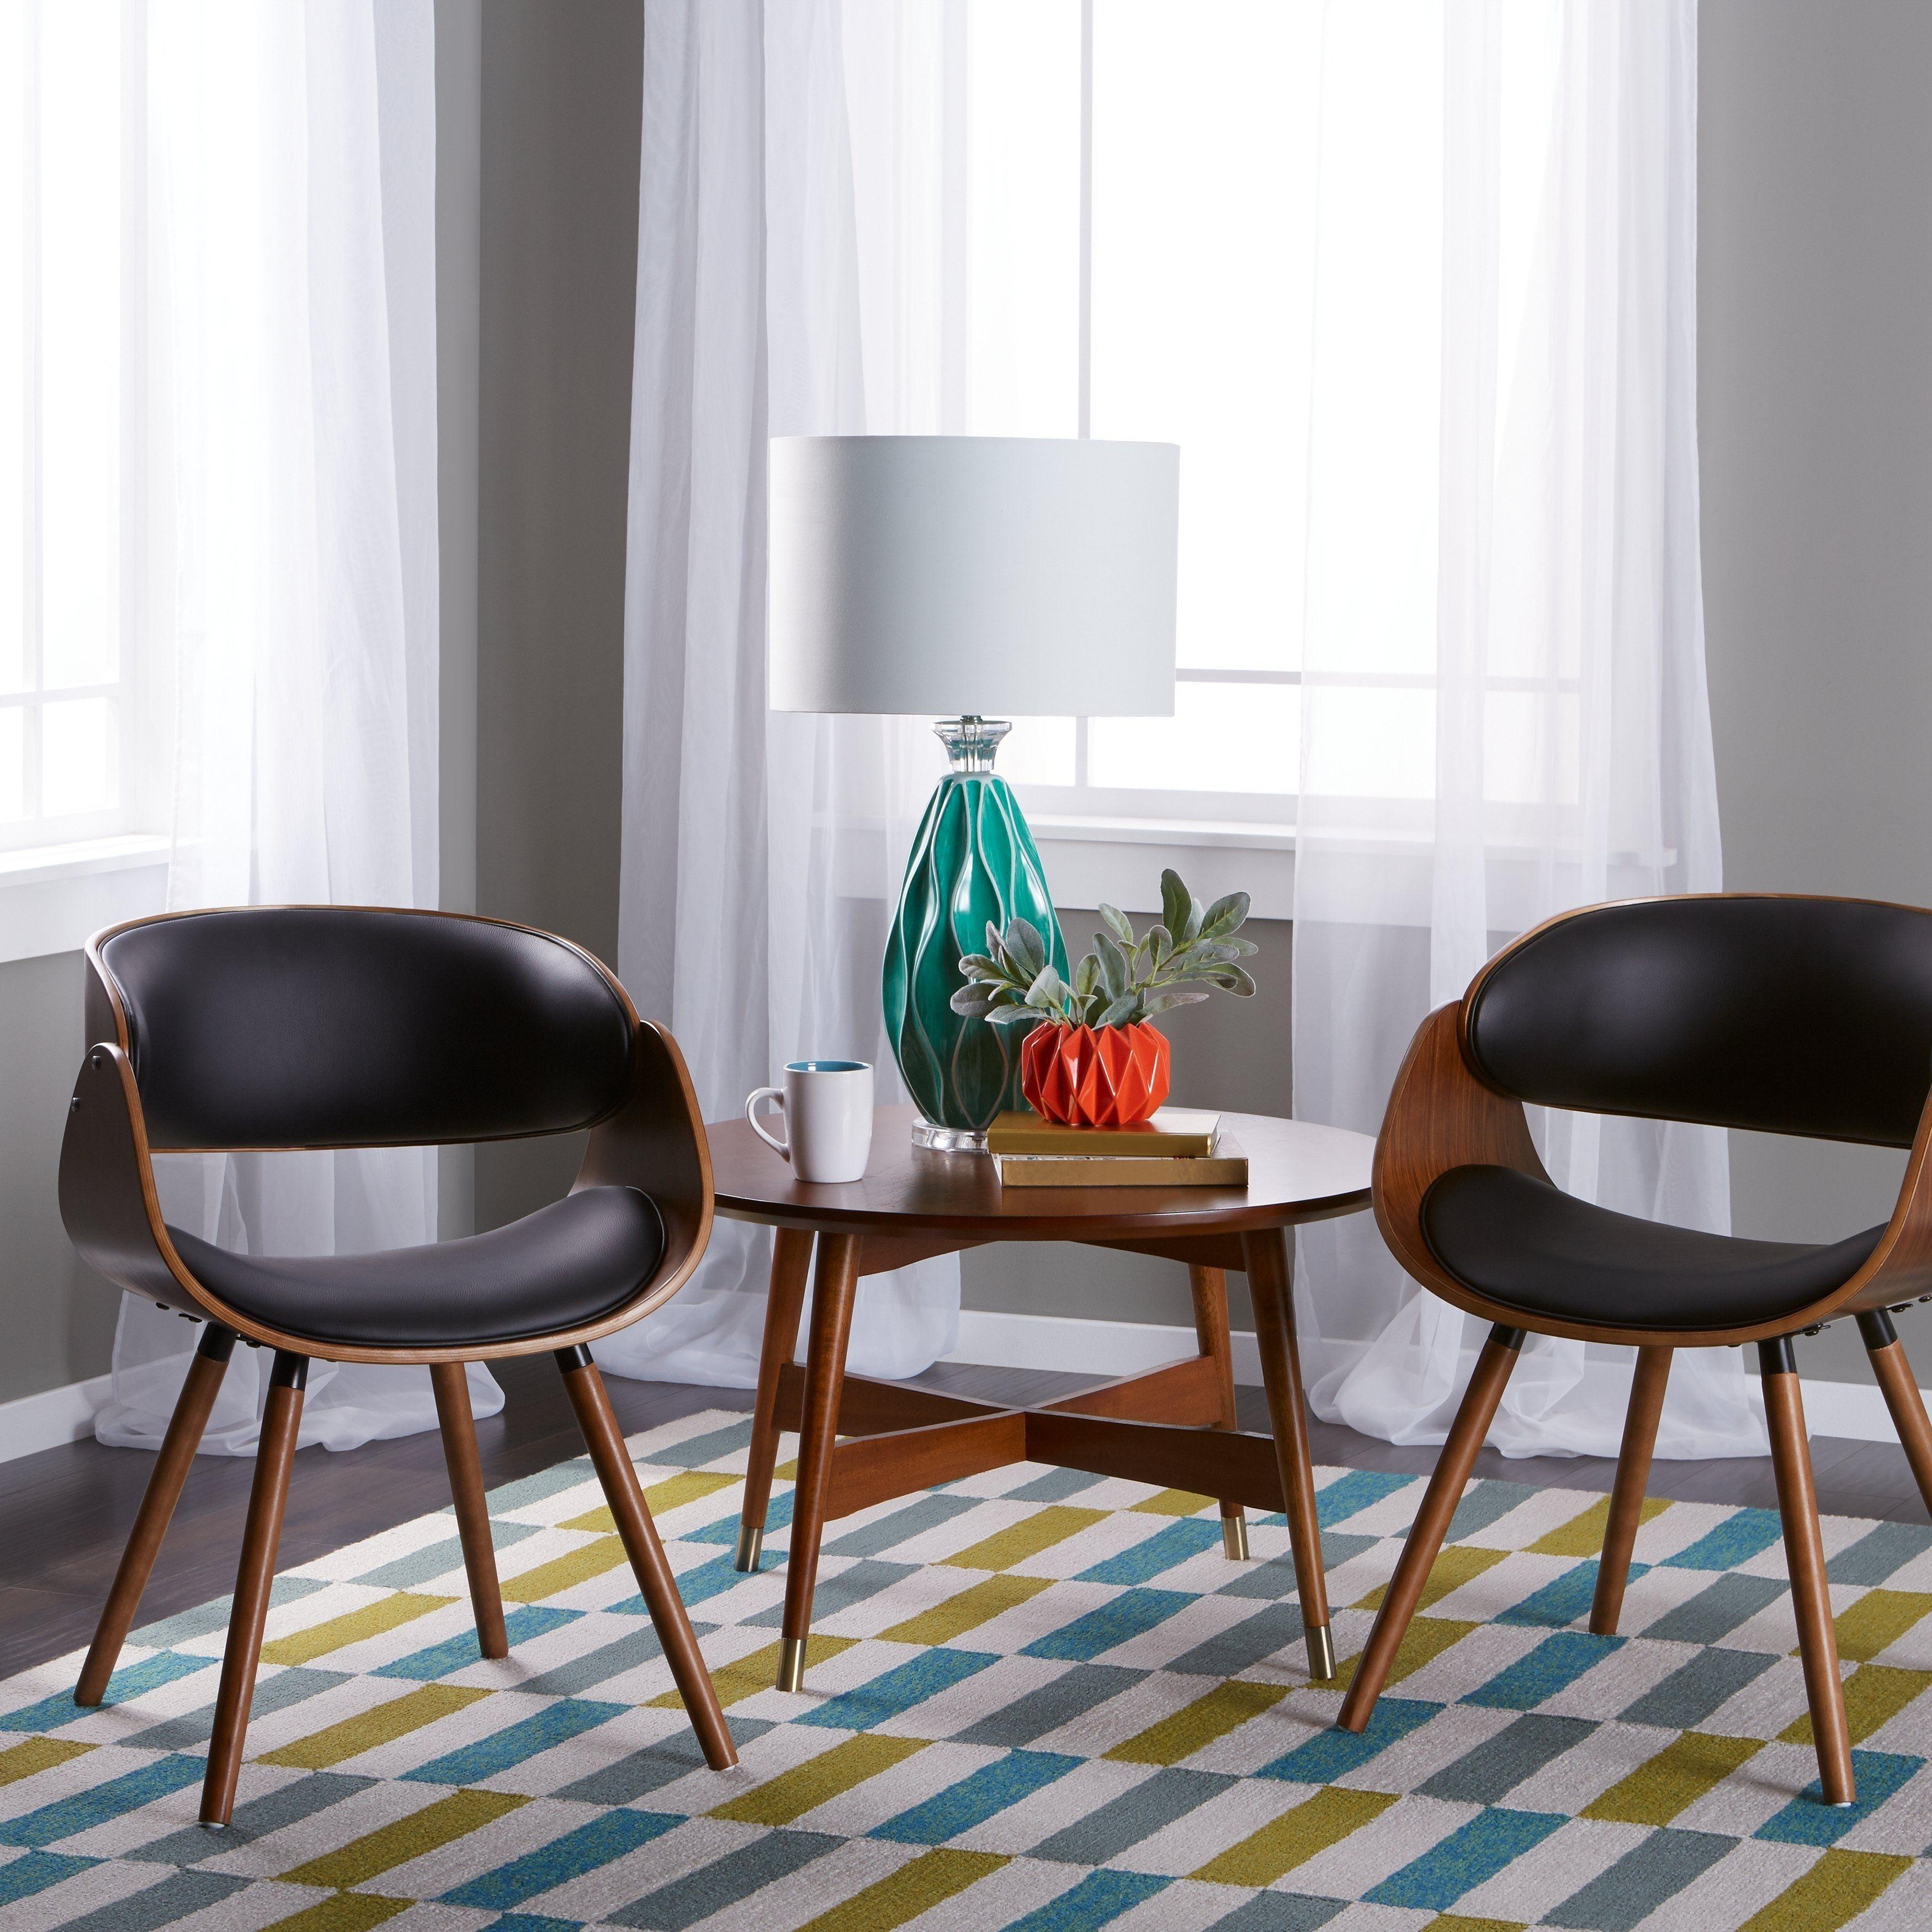 Corvus midcentury modern accent chair 2 chairs black